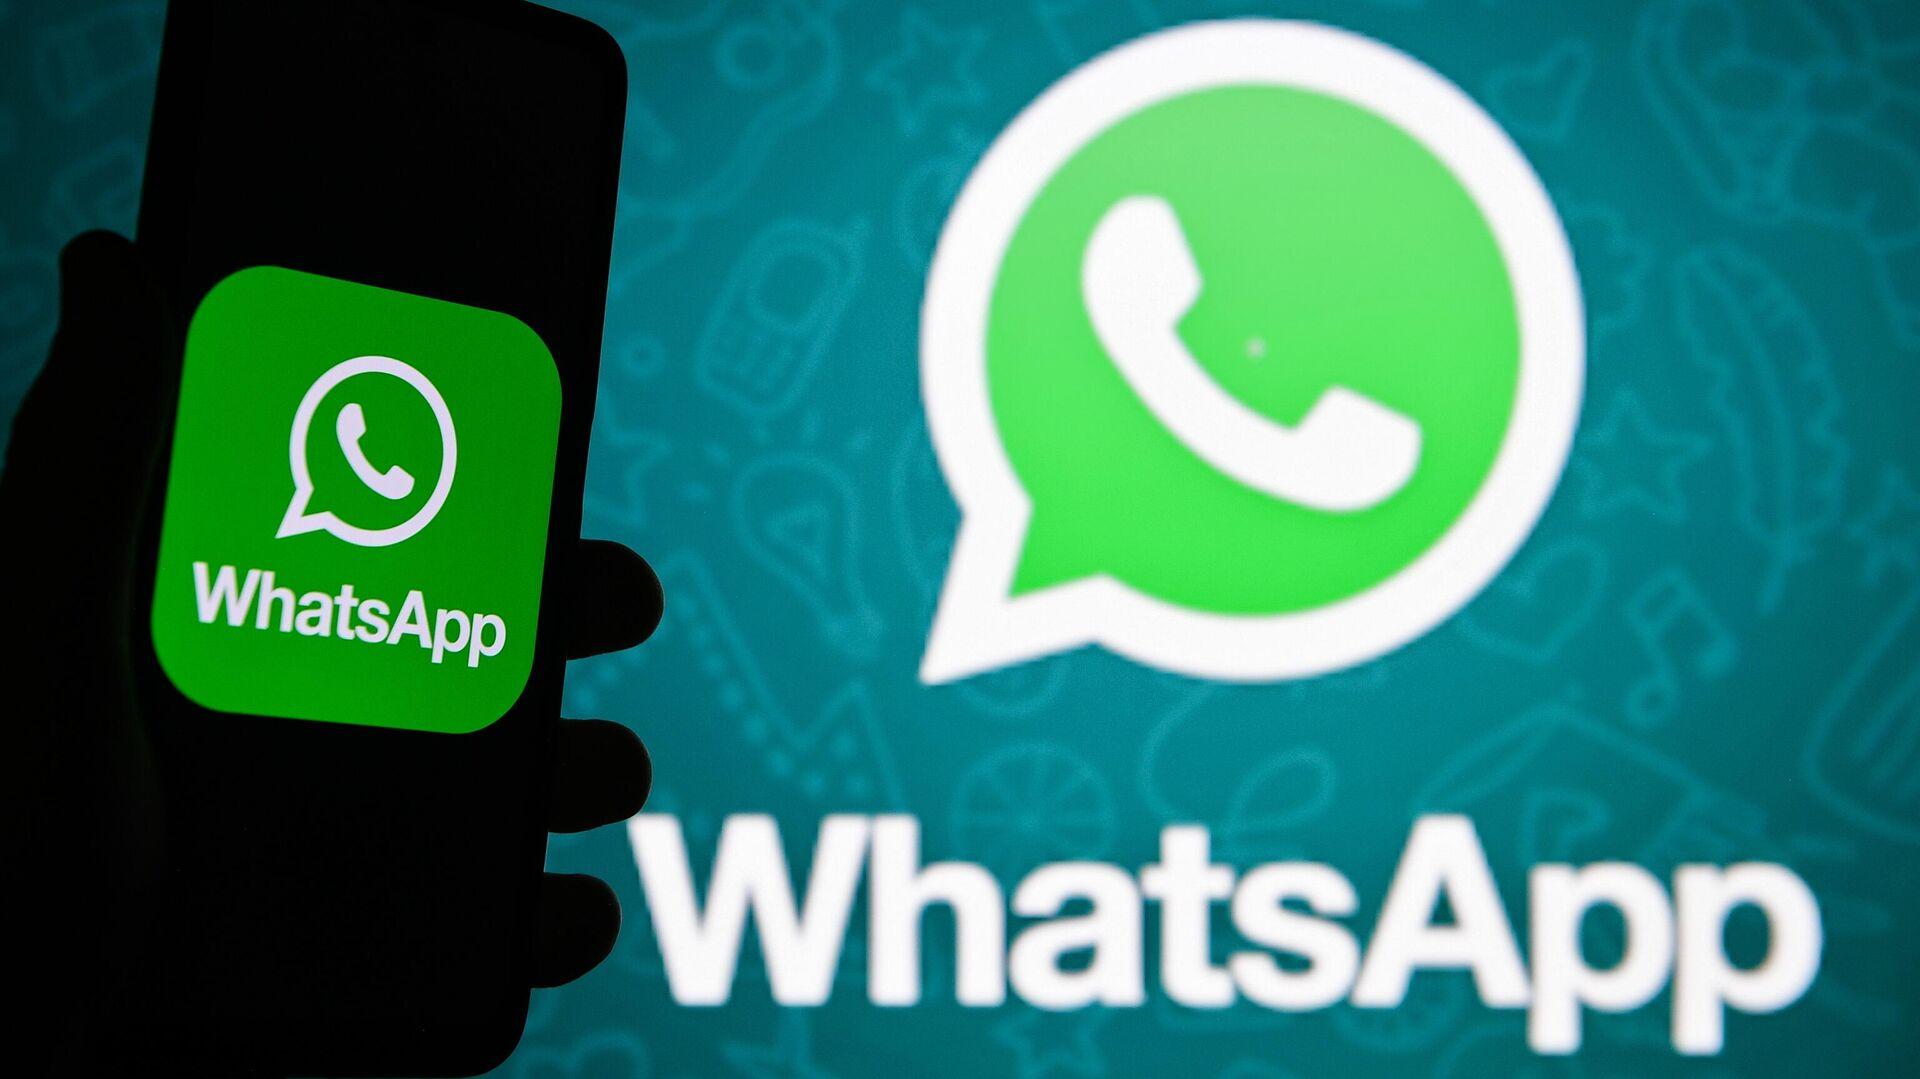 Логотип мессенджера WhatsApp - РИА Новости, 1920, 16.05.2021